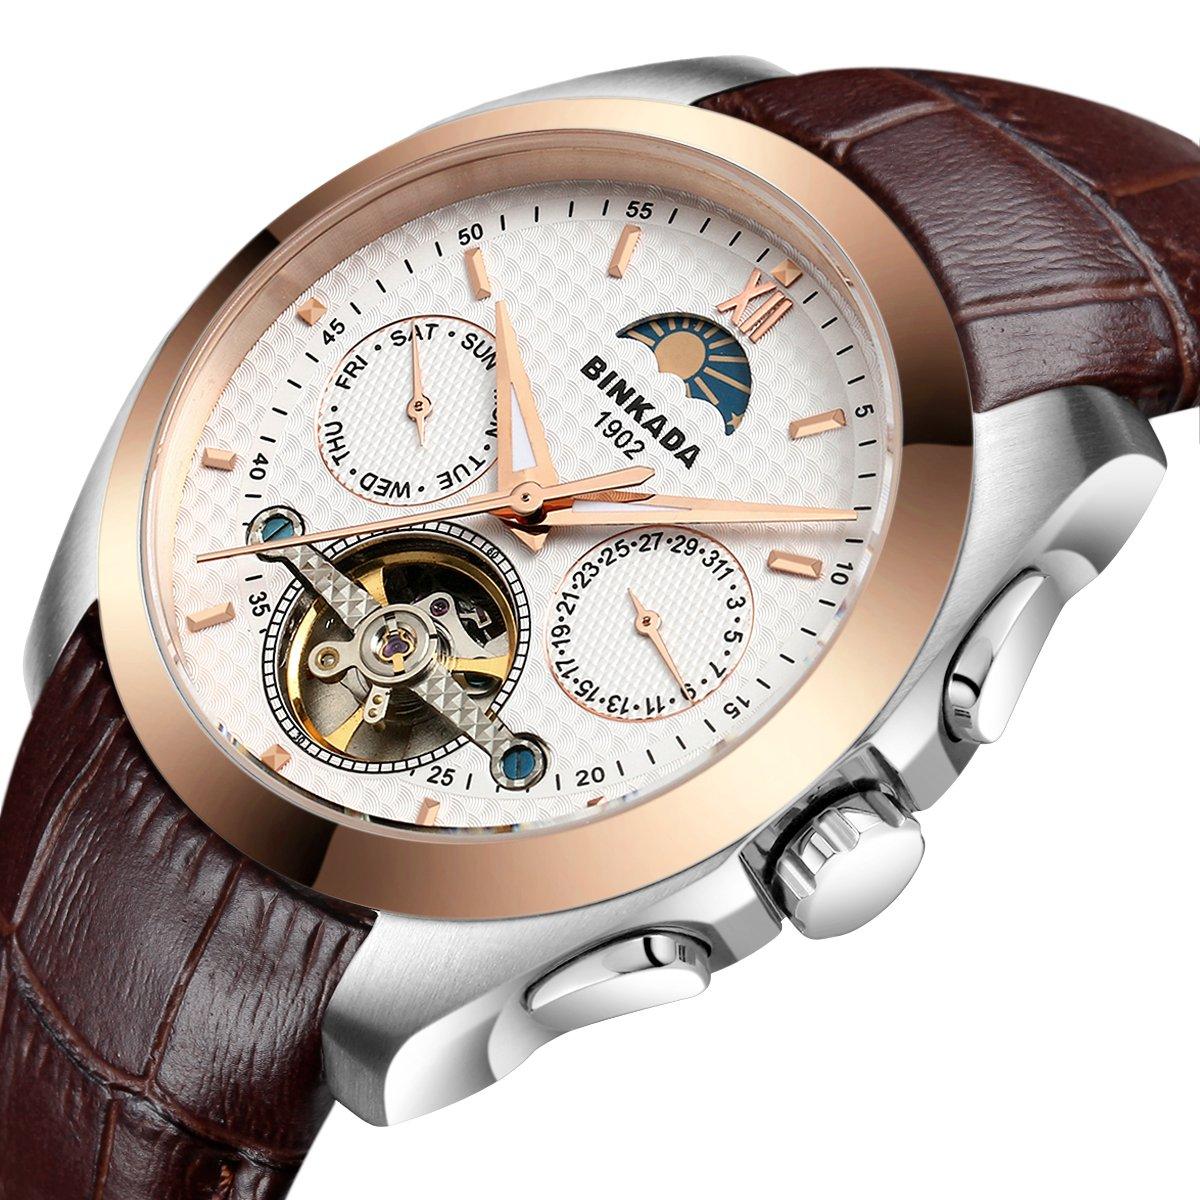 BINKADA 5ポインタ自動機械ビジネスカジュアルメンズ腕時計for Mens Wrist Watches Brown Band-Gold White Dial B018M84UCA Brown Band-Gold White Dial Brown Band-Gold White Dial